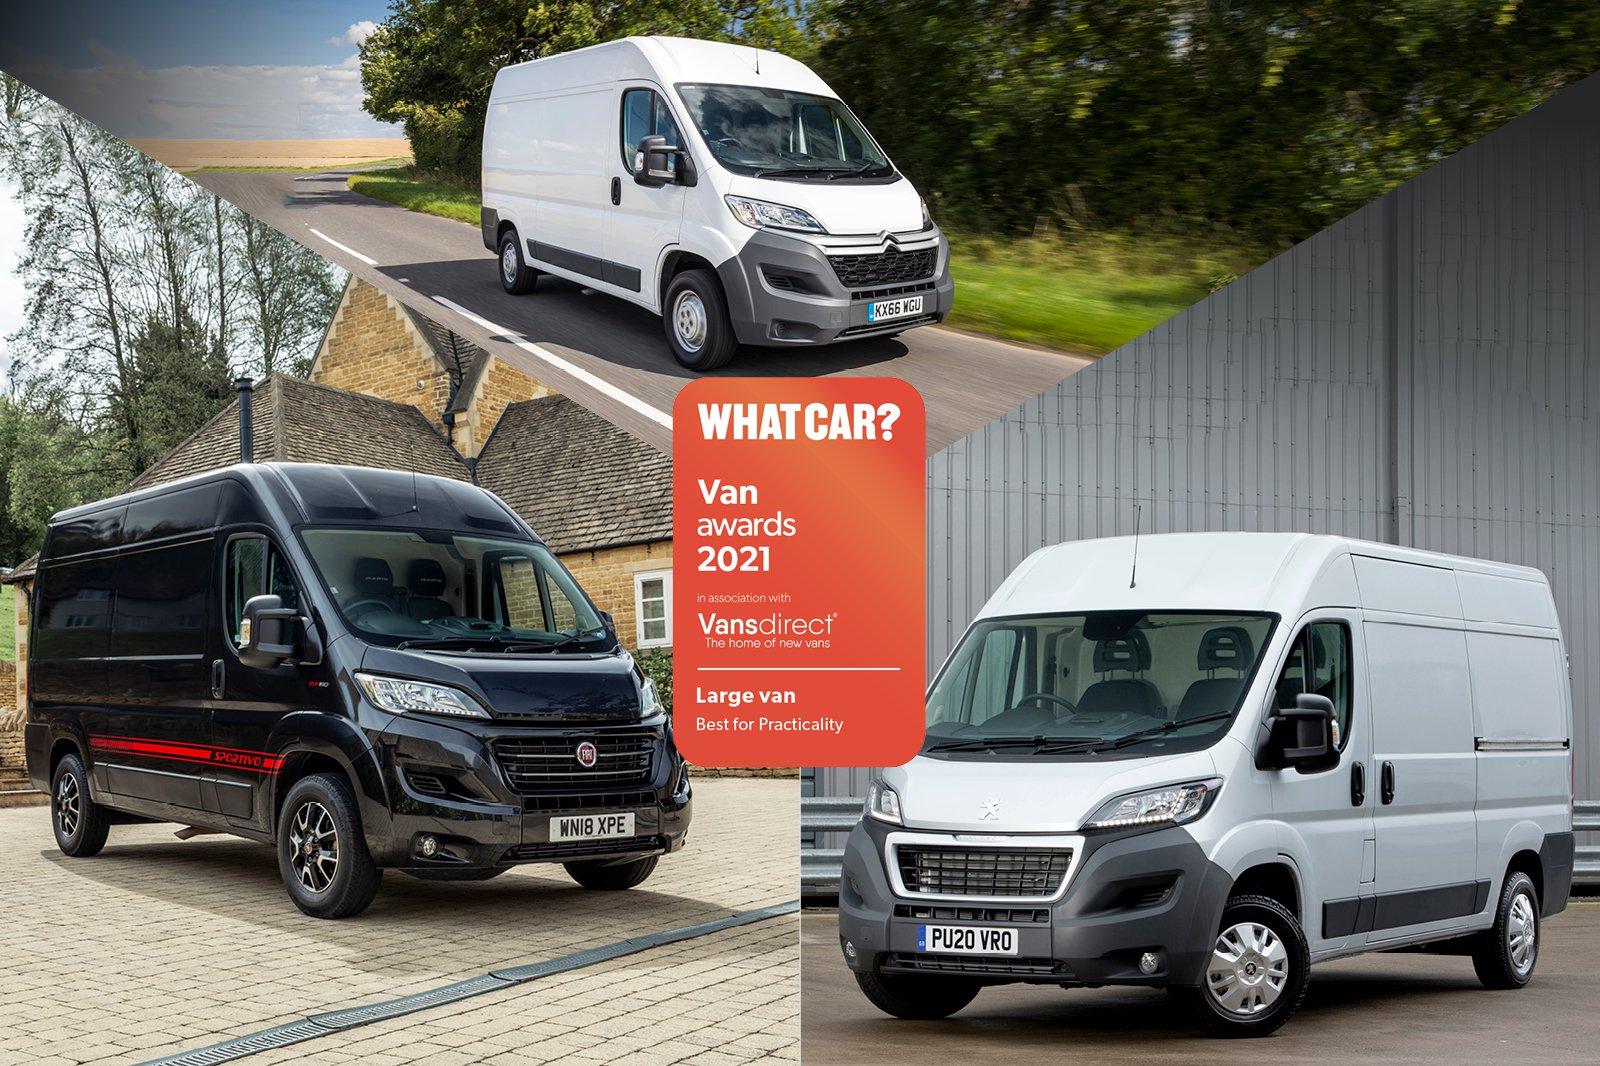 Van Awards 2021 - Large Van - Practicality (new logo)